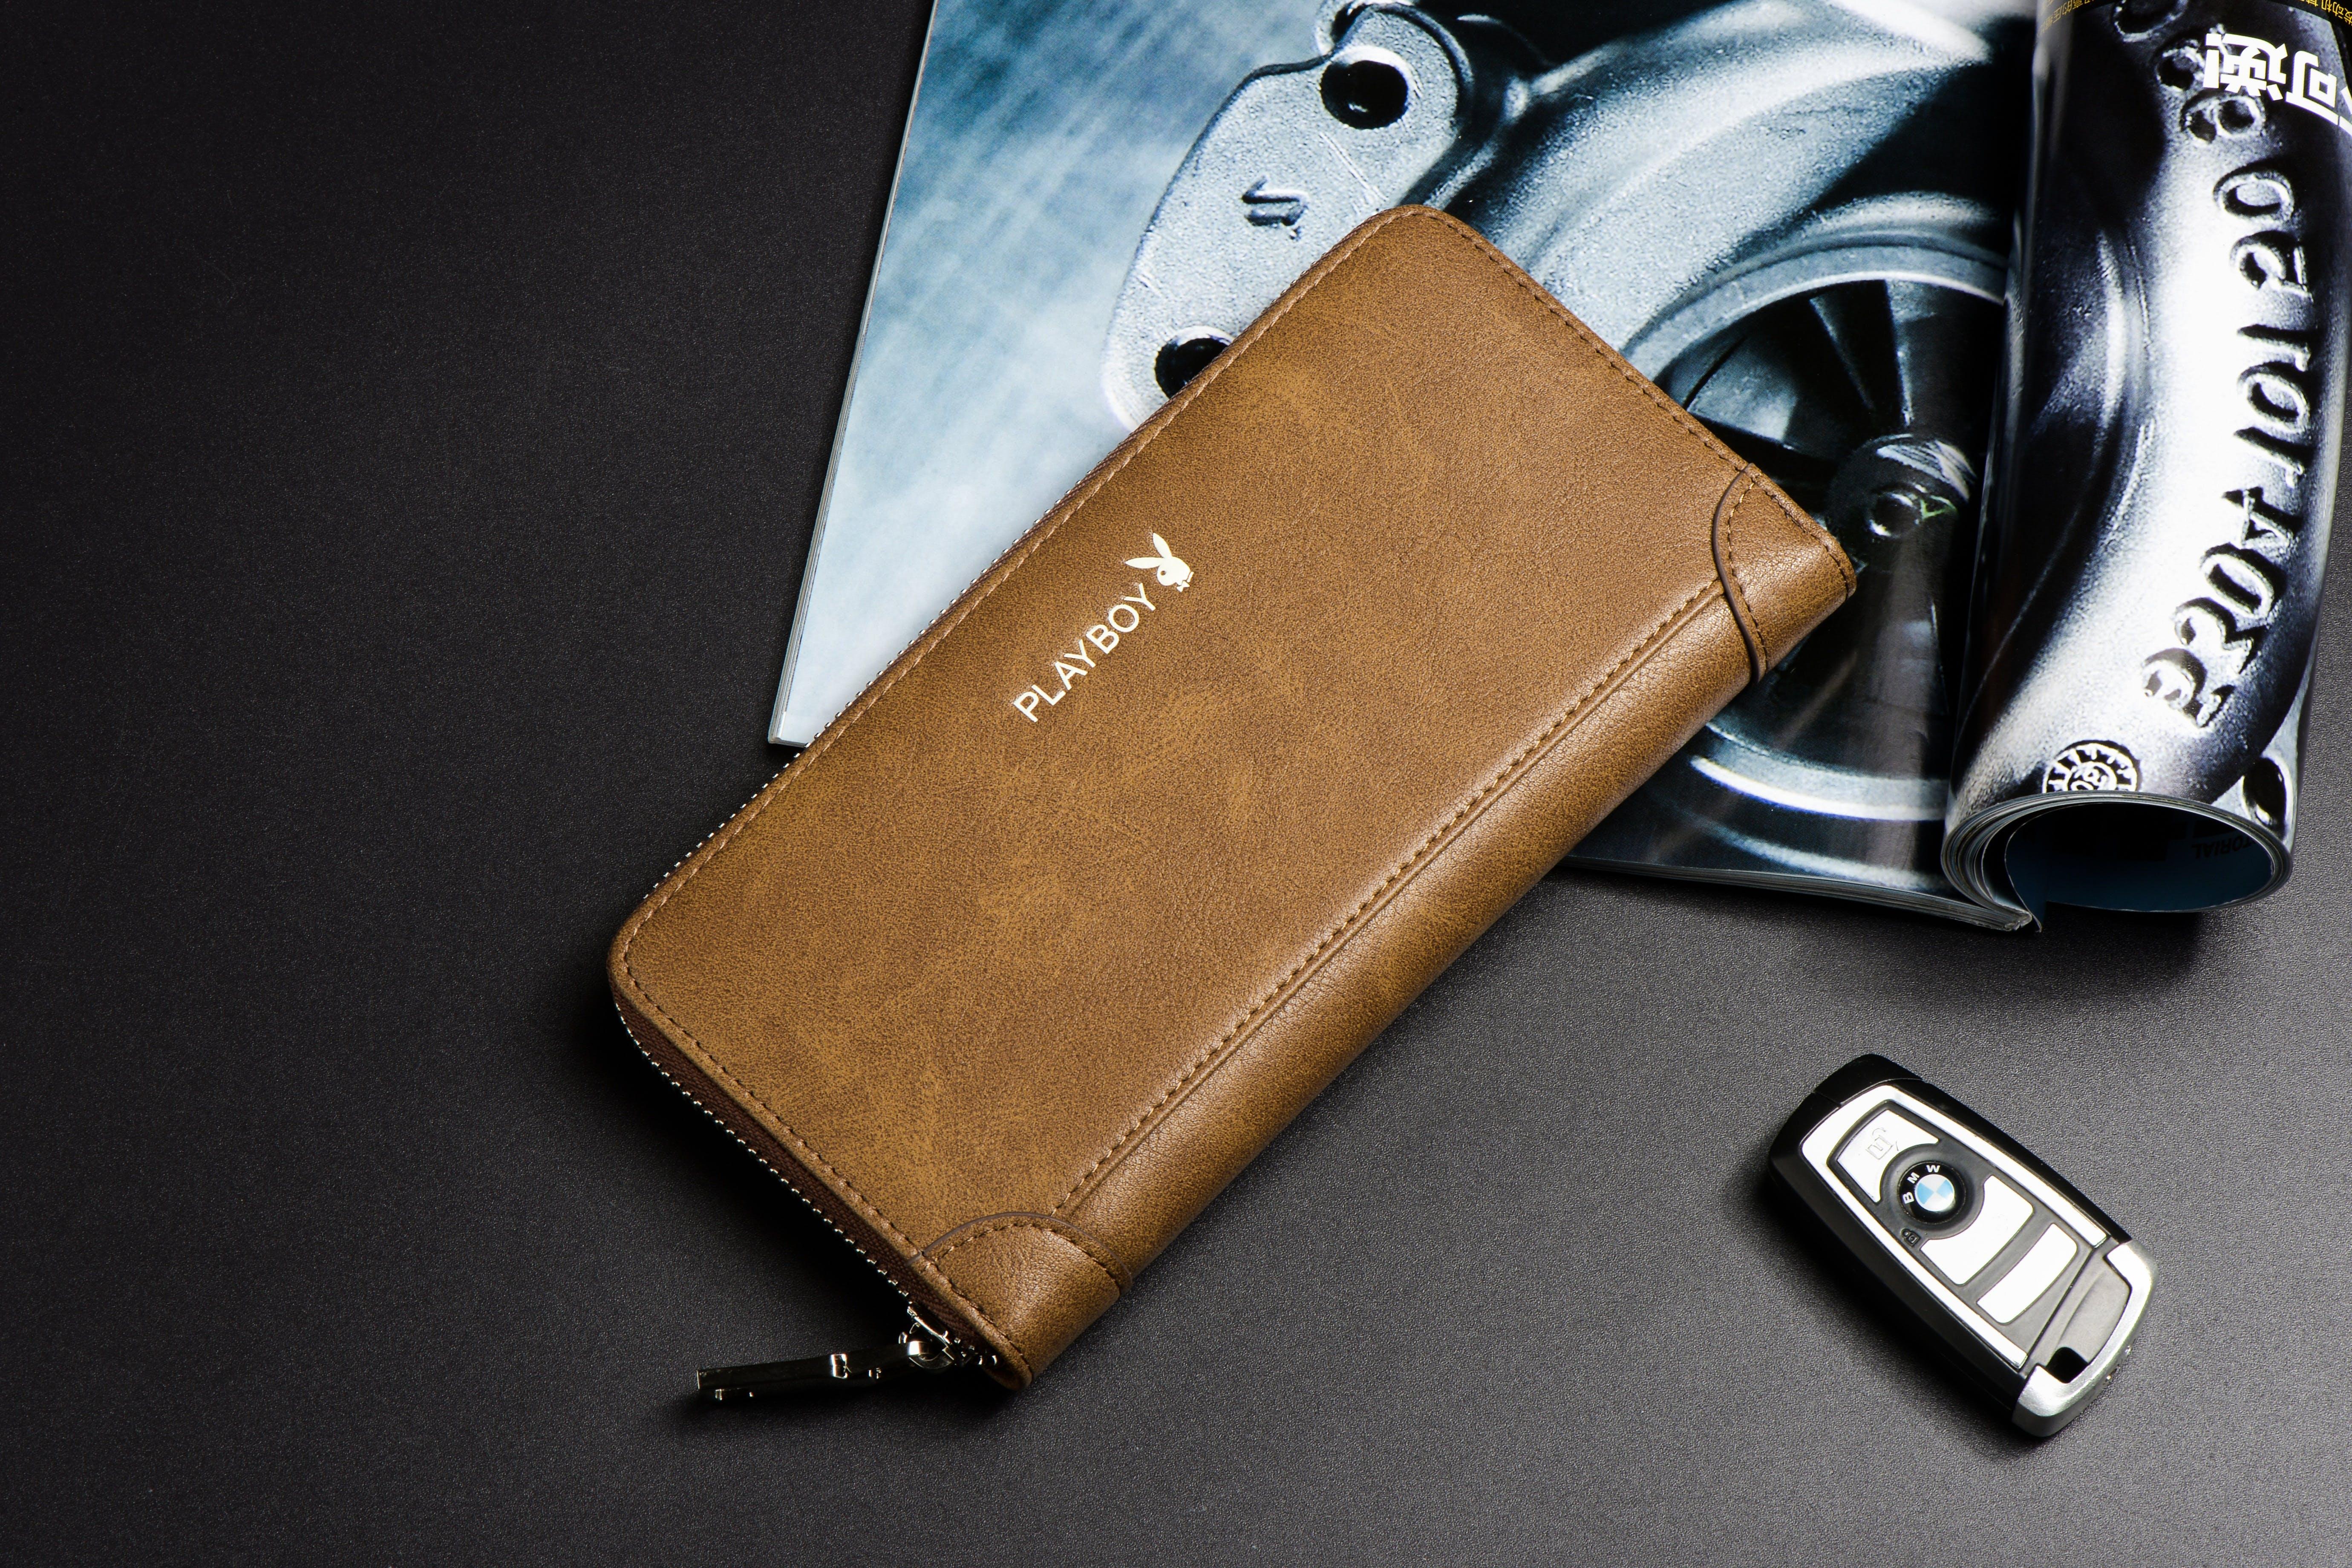 Brown Leather Wallet Beside Black Key Fob